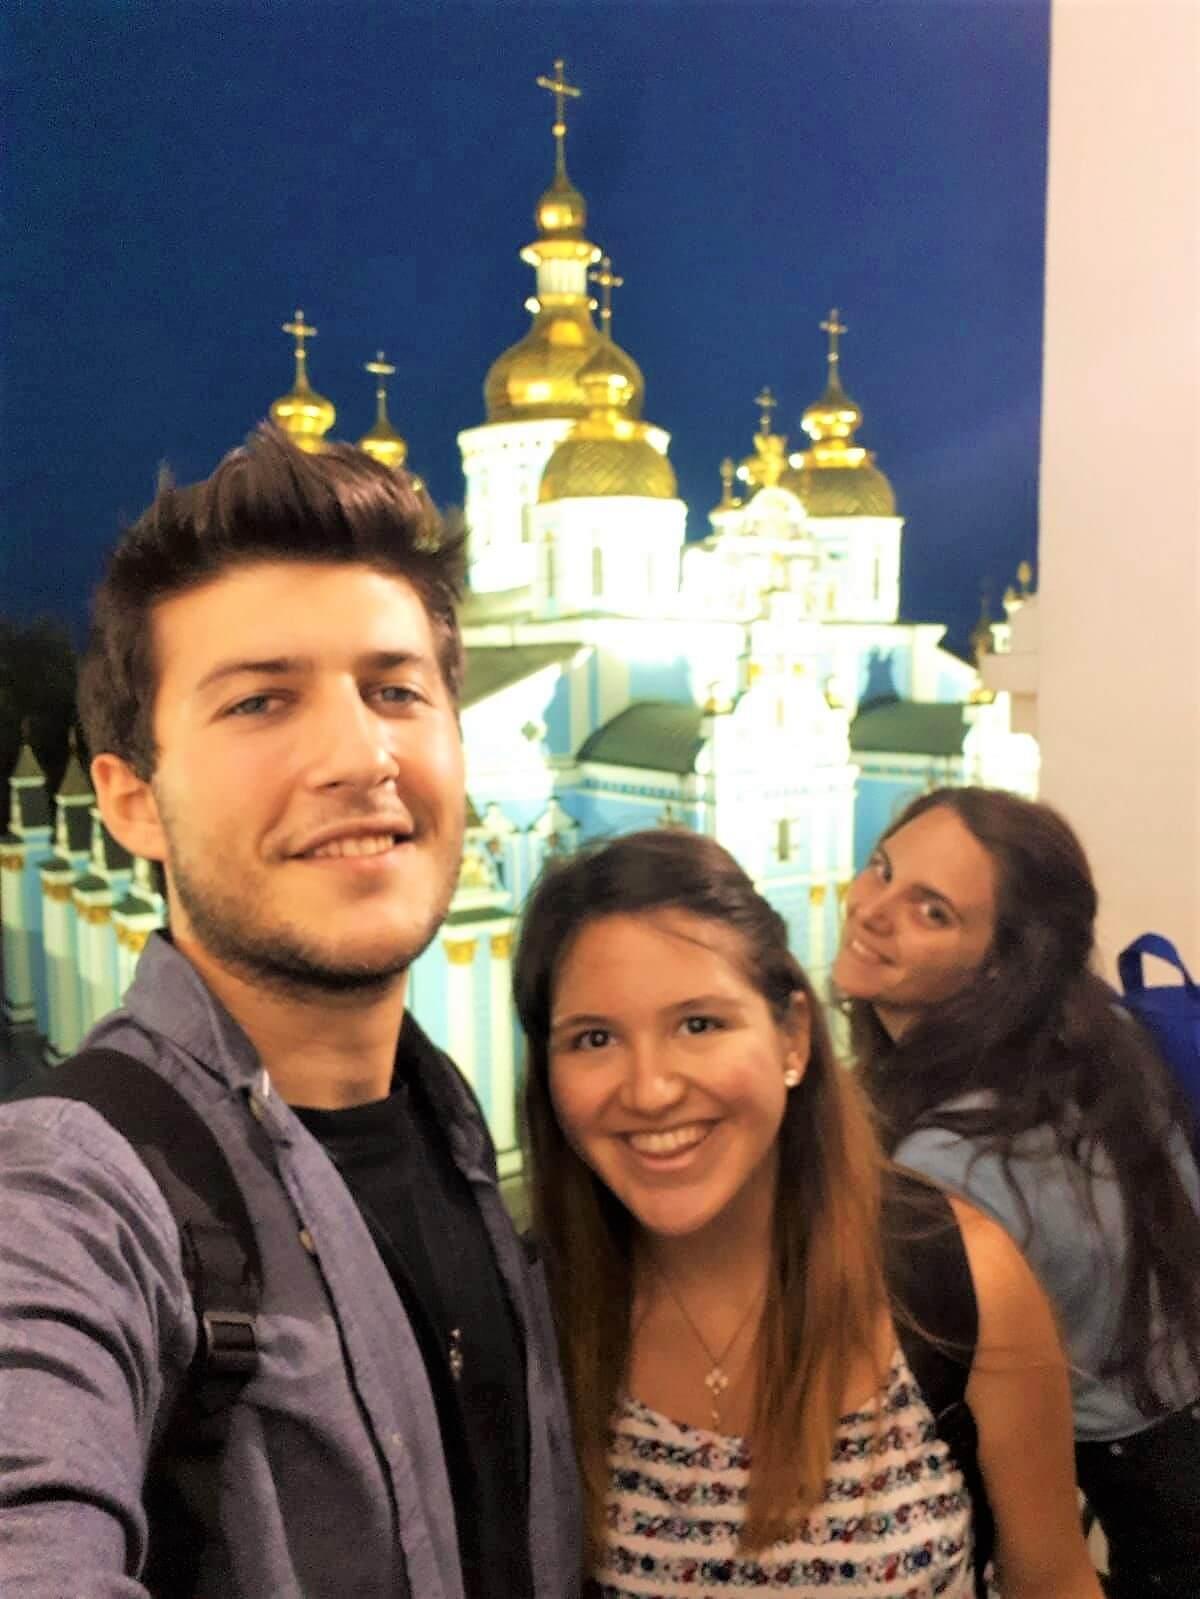 Soziales Projekt im Ausland